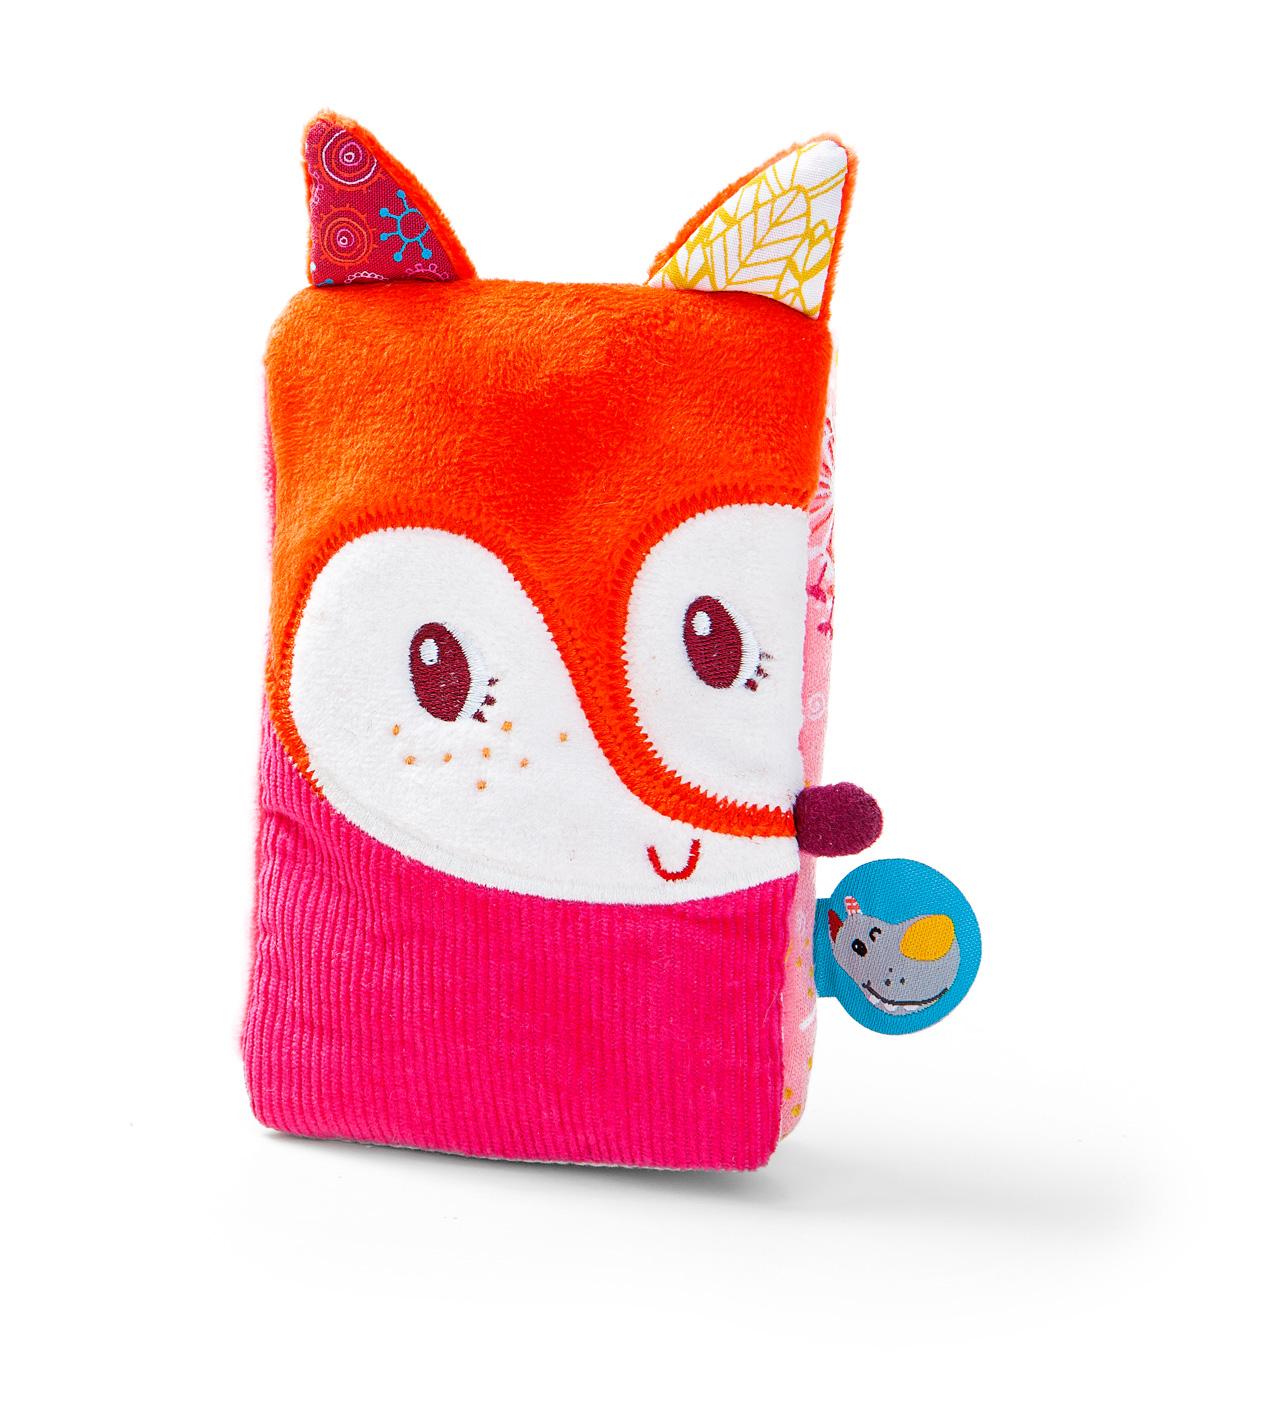 Stoff Spielzeug Smartphone Alice Fuchs